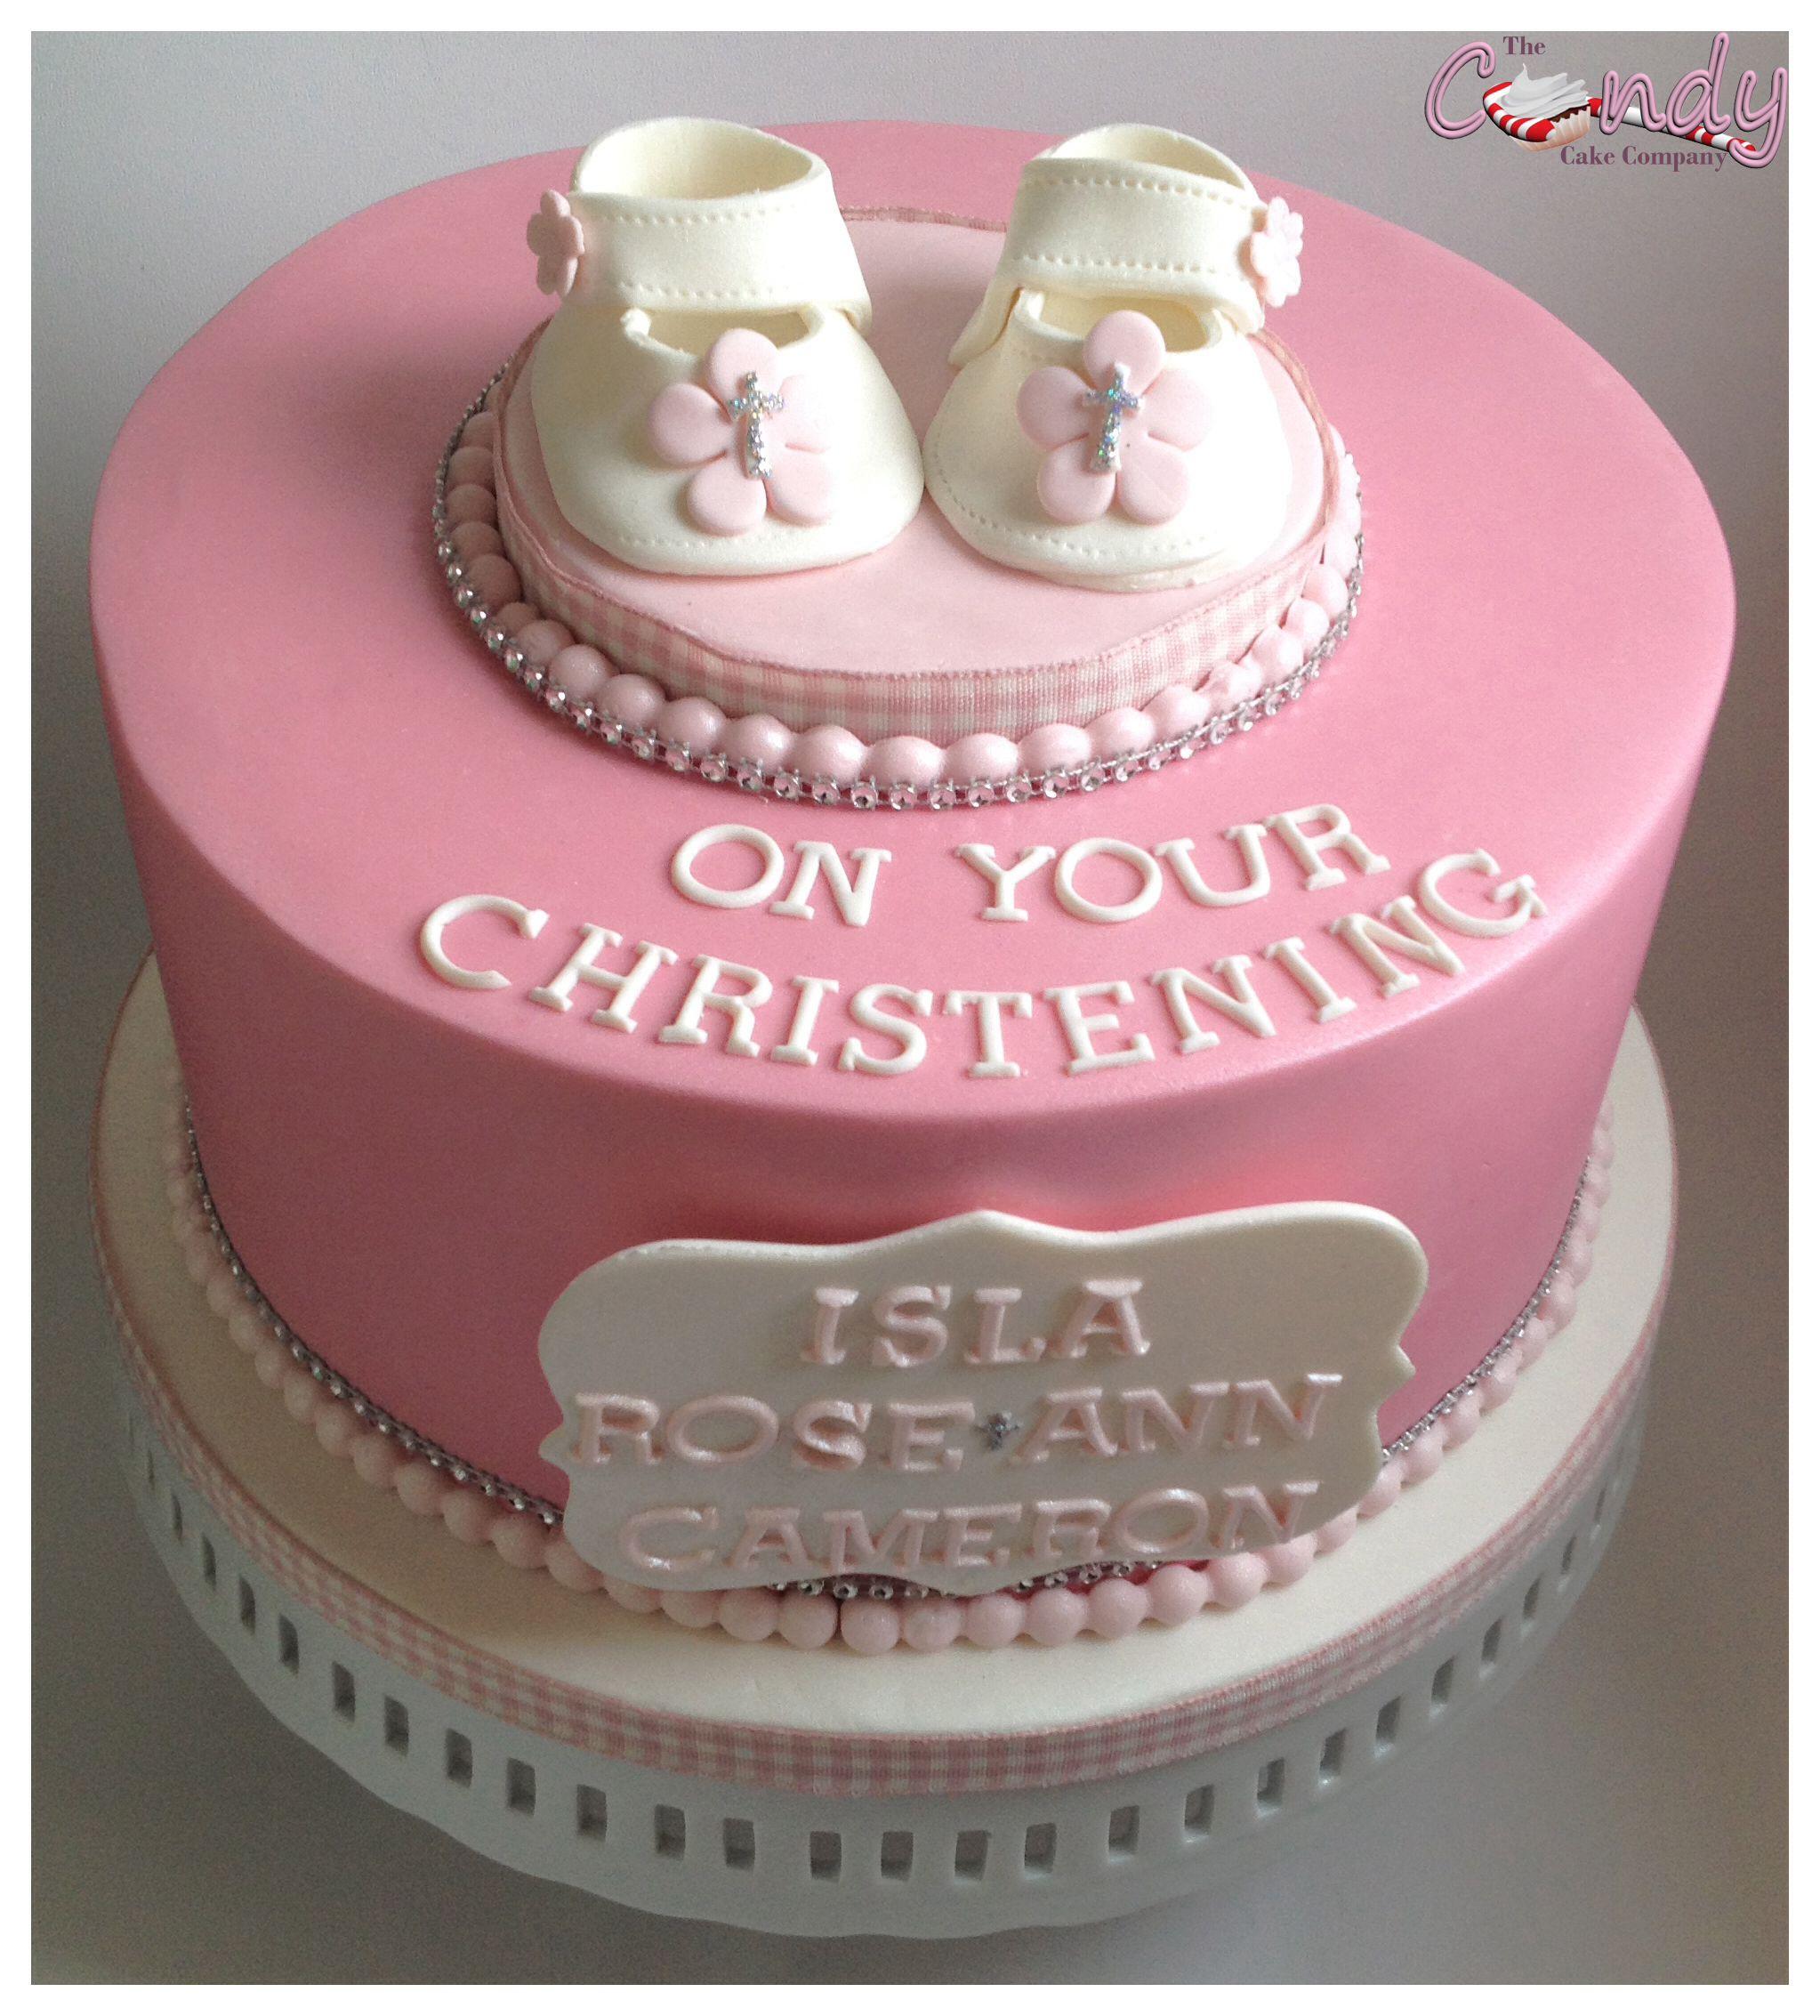 Baby girls Christening cake The Candy Cake Company Dartford Kent